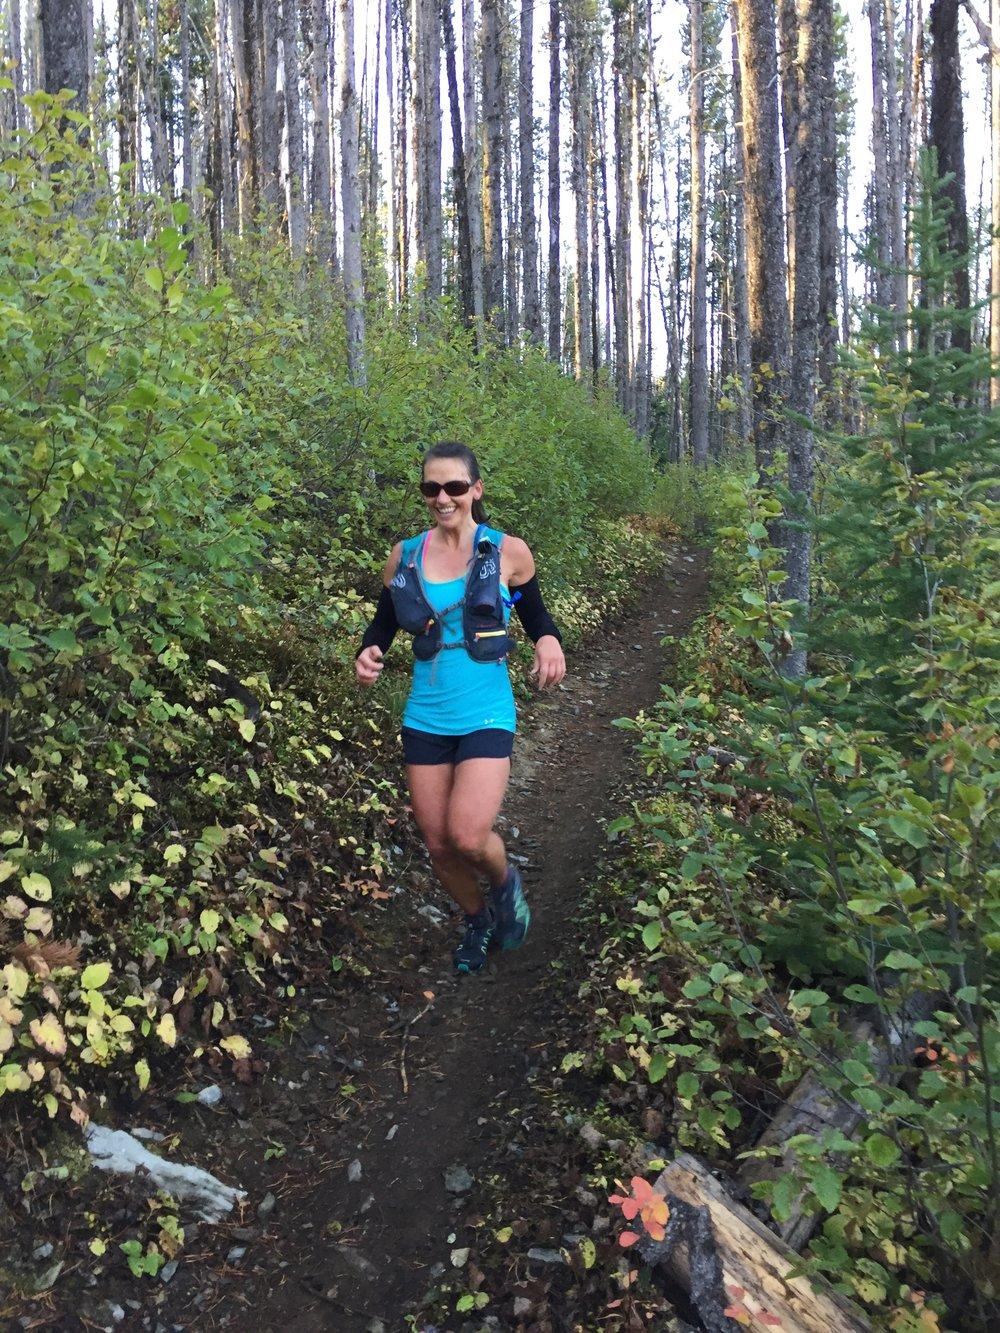 foys to blacktail trails trail marathon ftbtIMG_1053.JPG